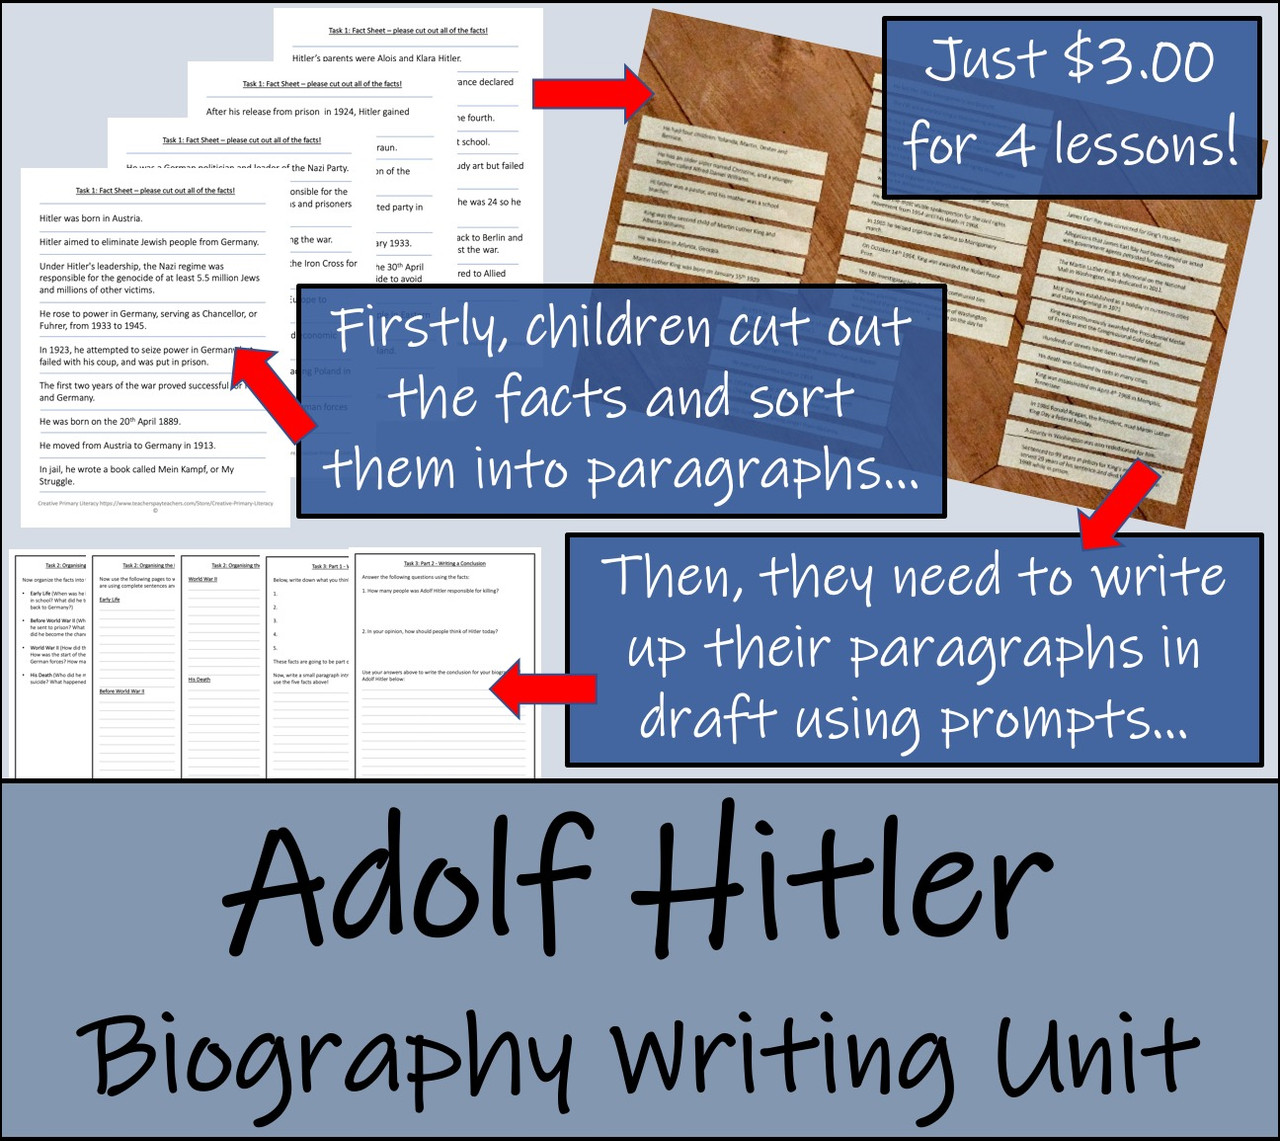 Adolf Hitler - 5th & 6th Grade Biography Writing Activity